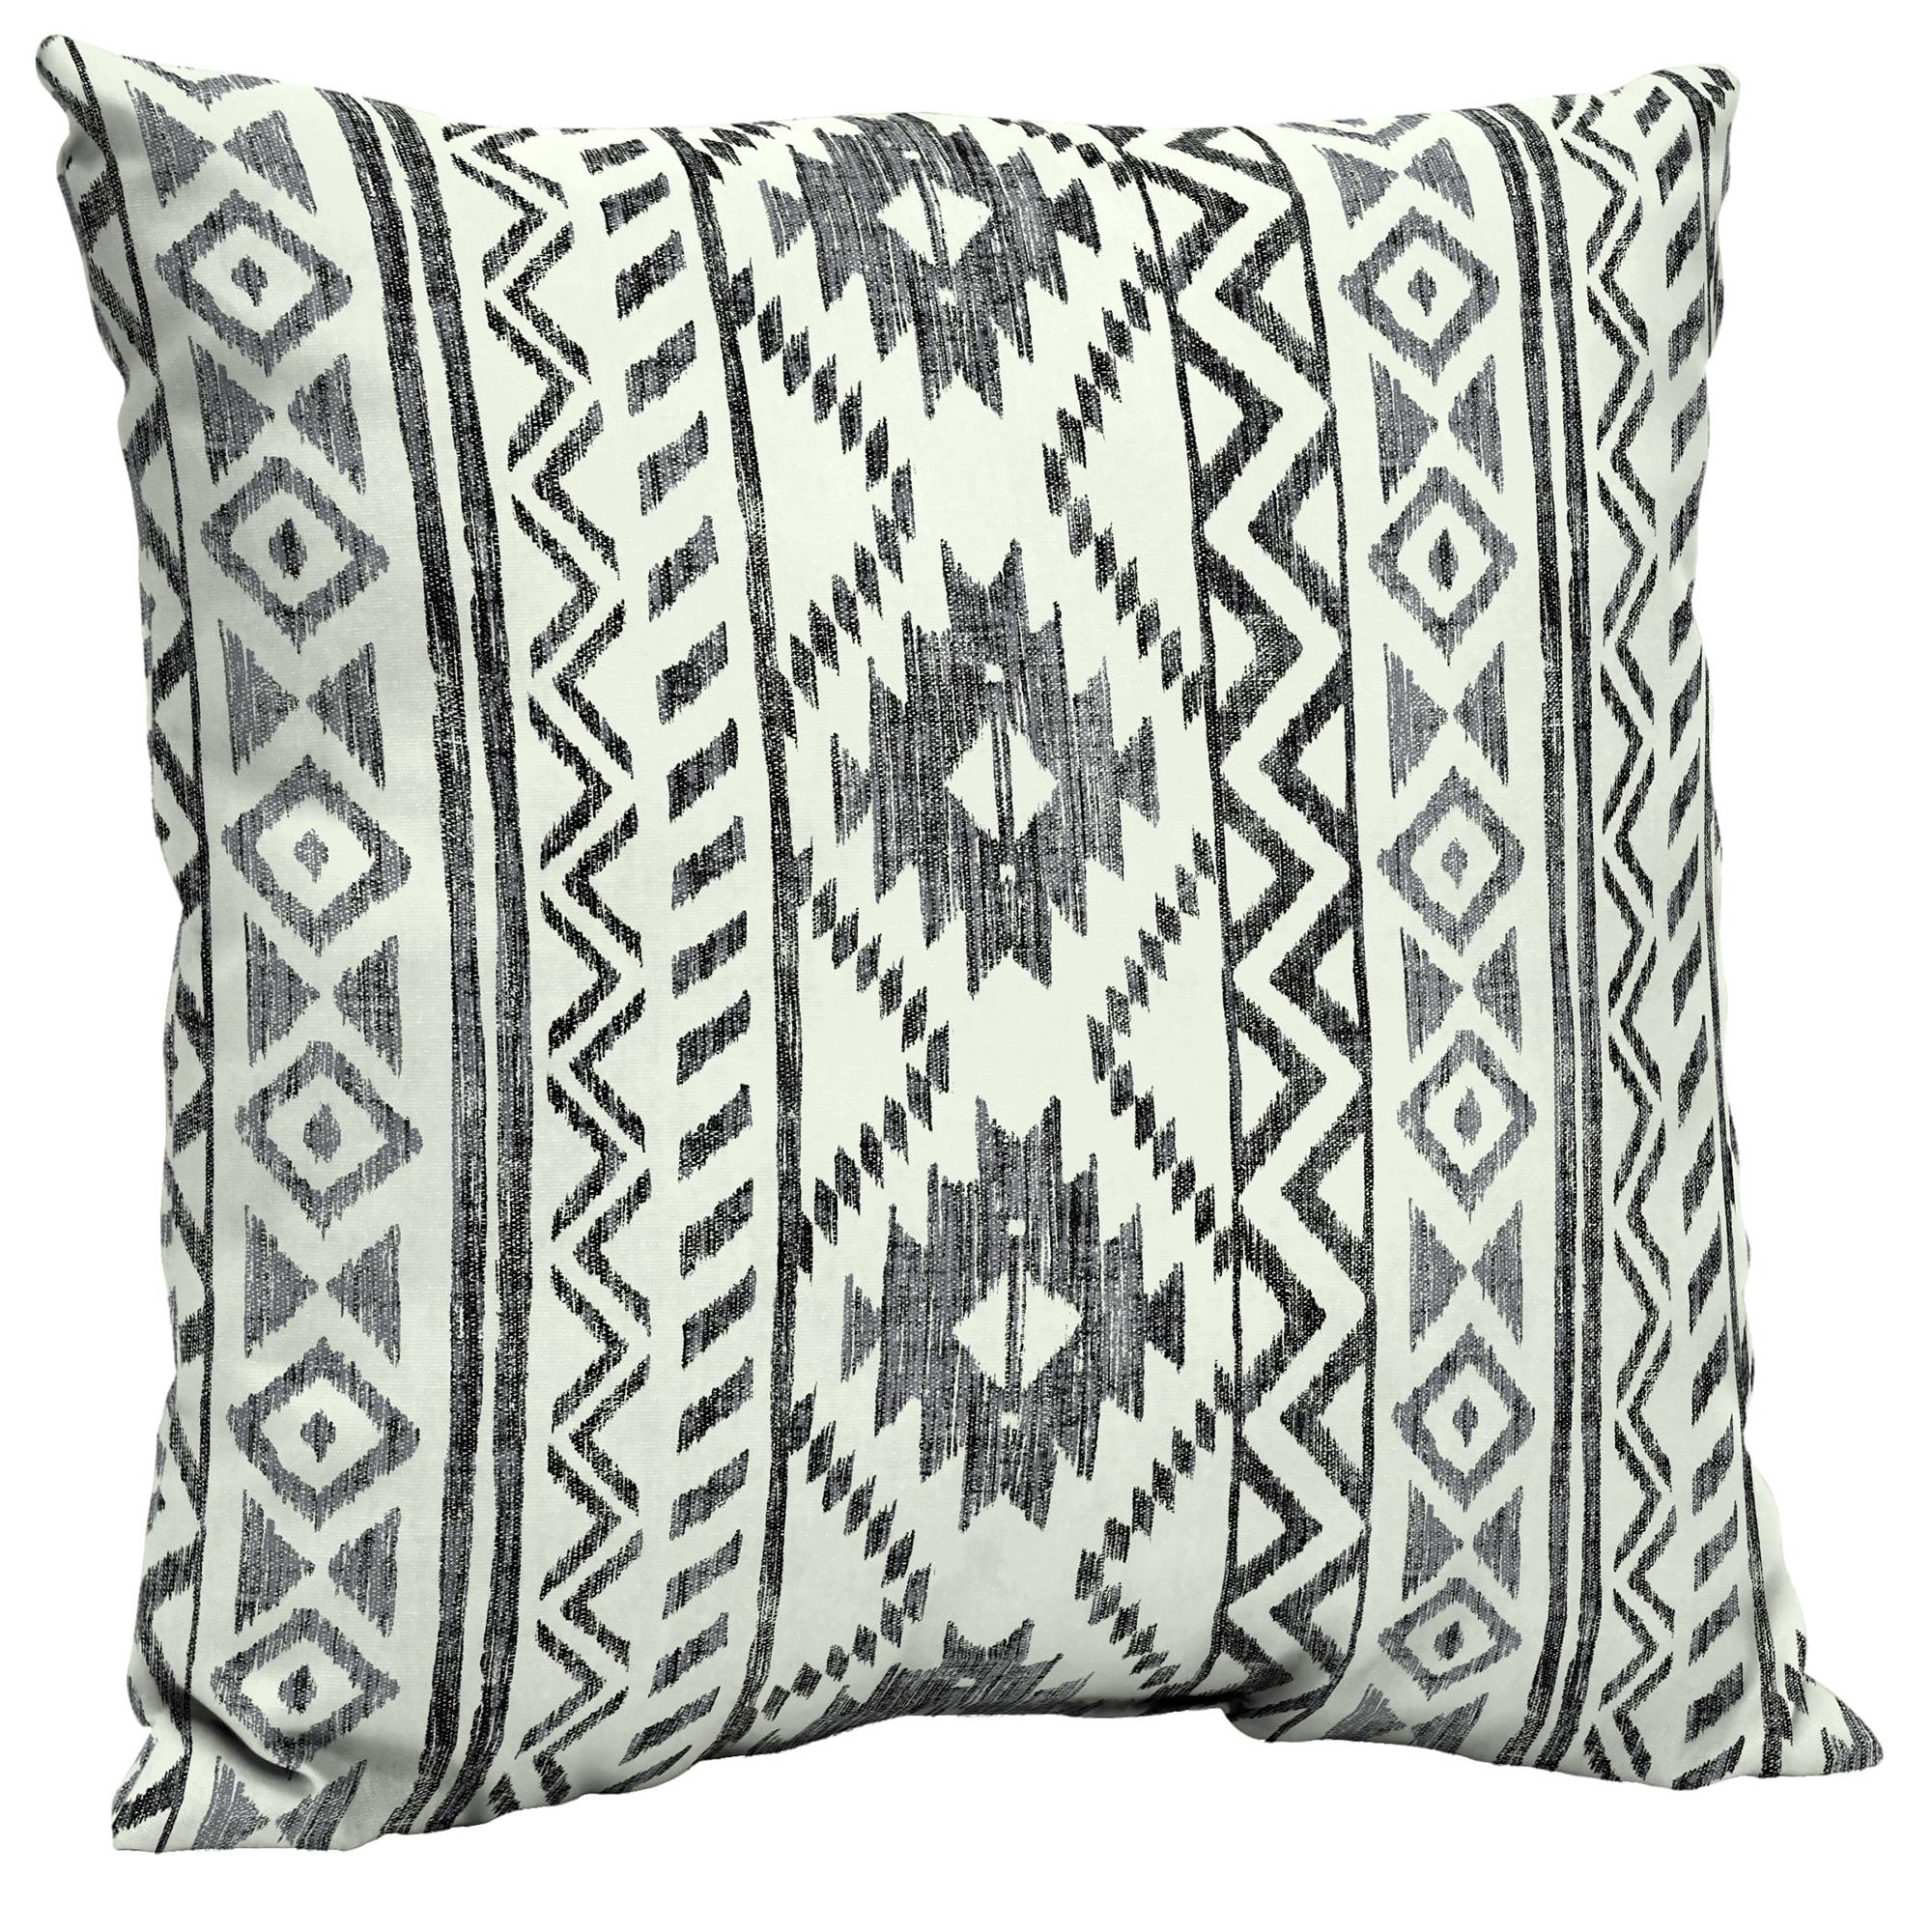 Hippie Tribal Pillow